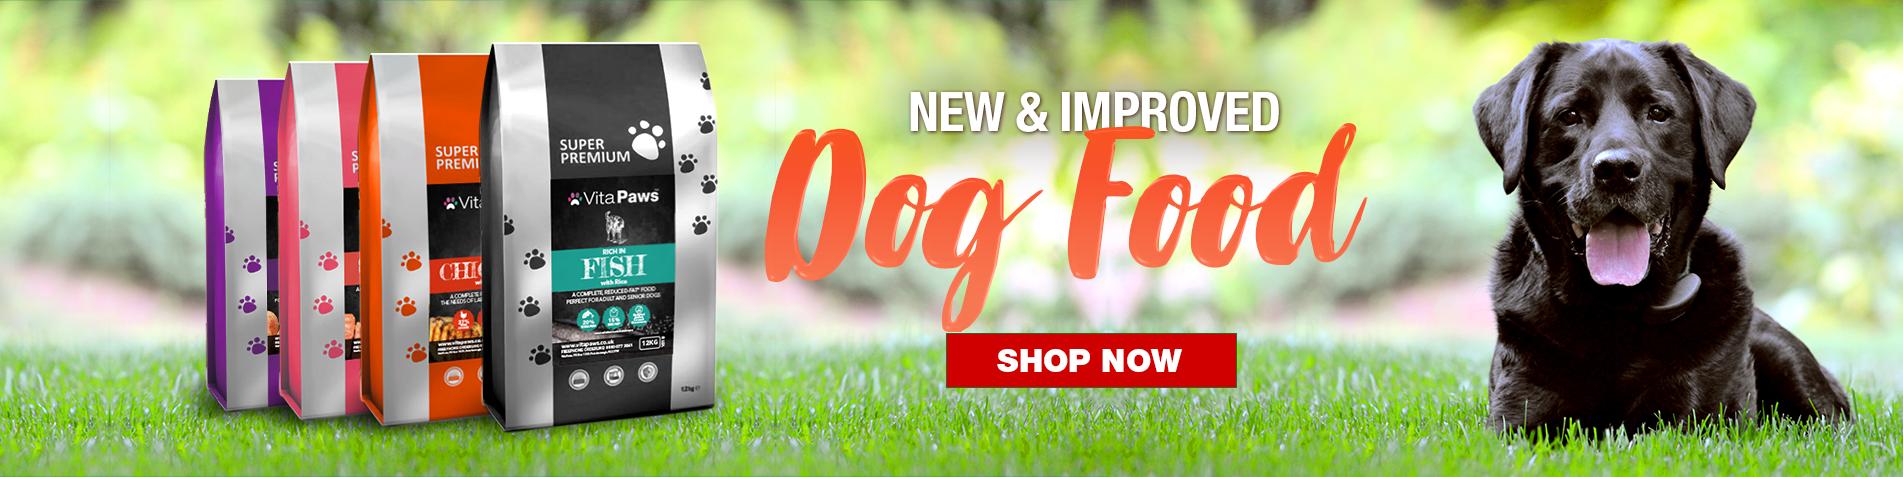 New - Dog Food